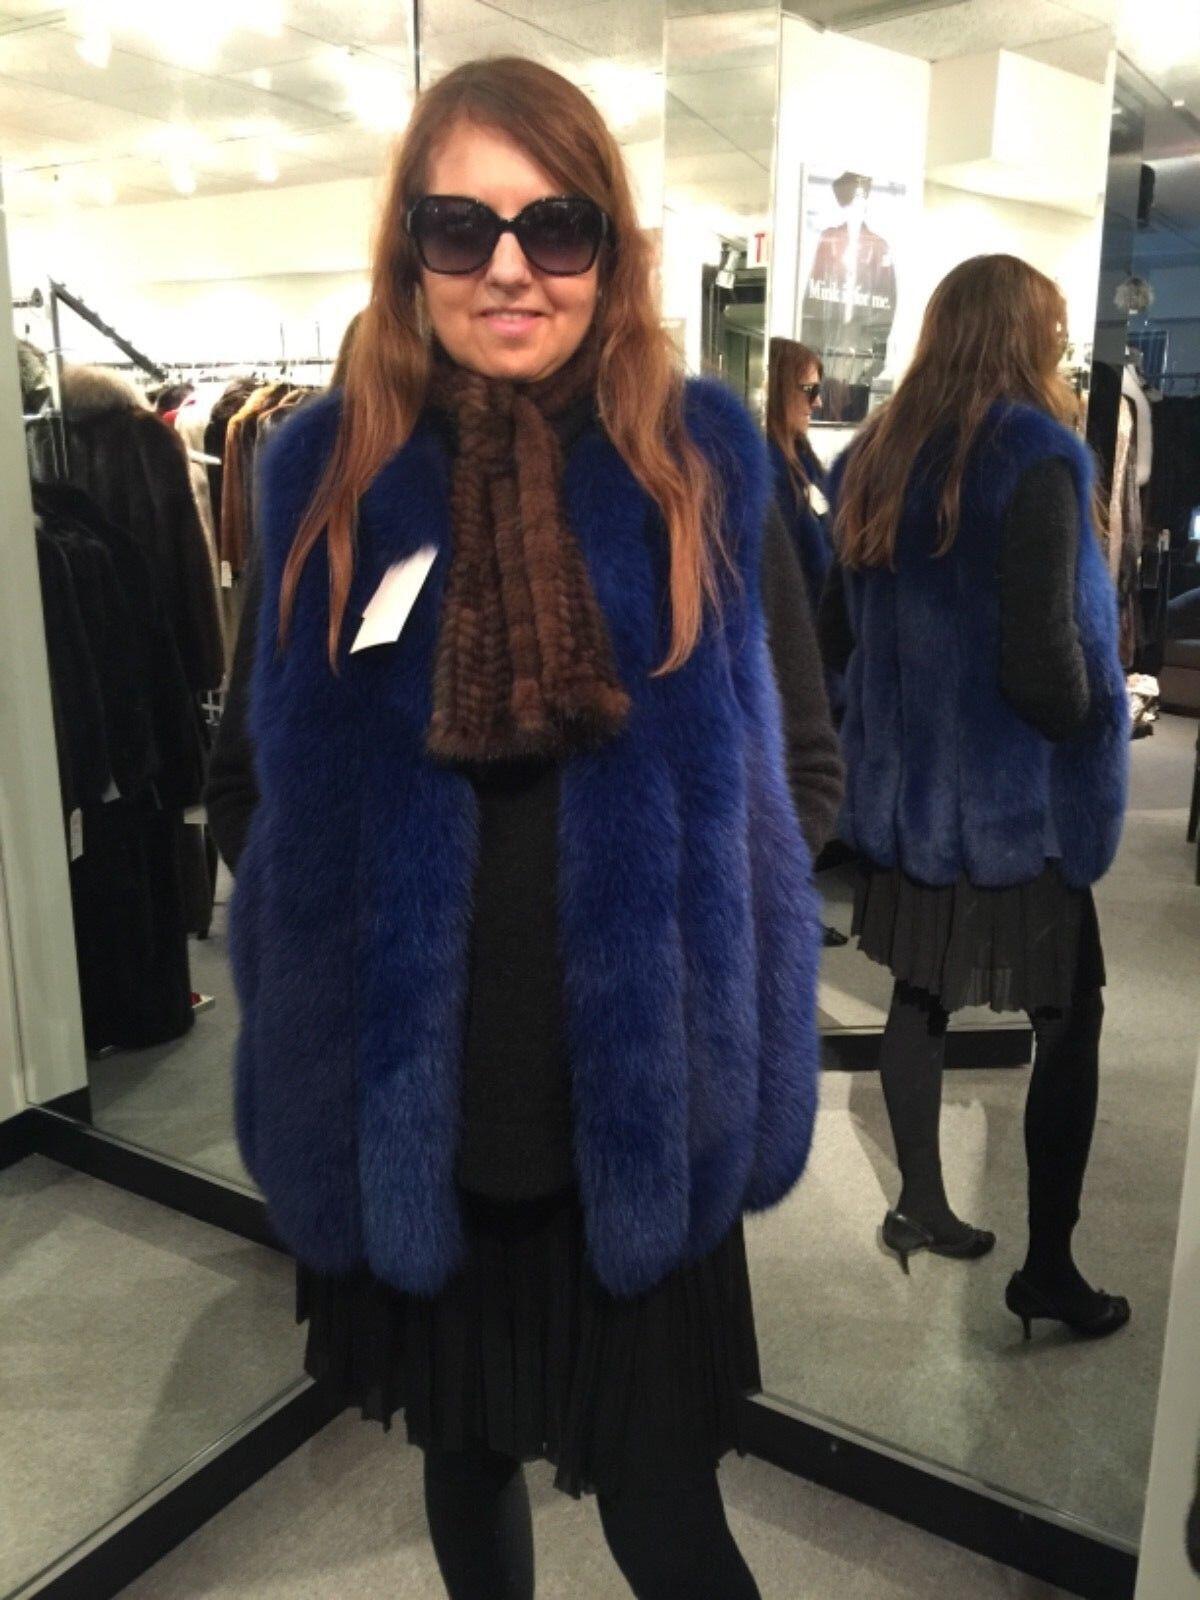 LUXURIOUS BRAND NEW W TAGS BEAUTIFUL NAVY blueE FOX VEST.SIZE S. REG. 3800.00